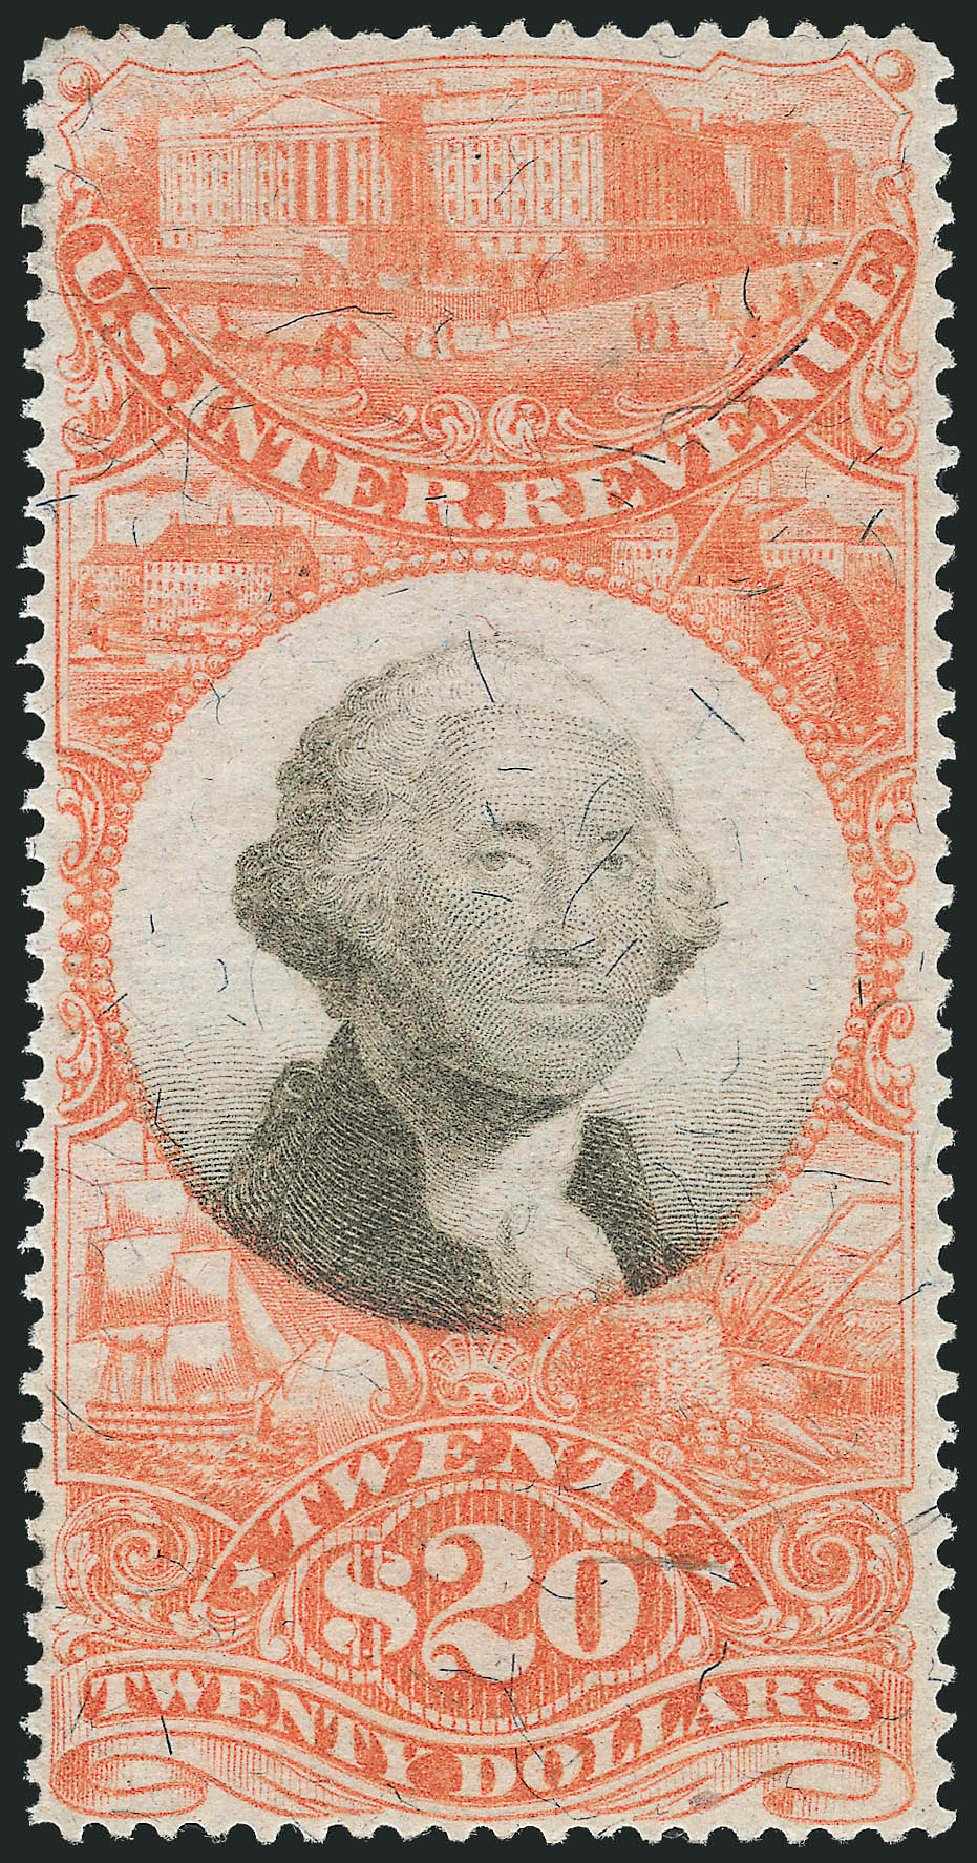 Costs of US Stamp Scott Catalogue # R150 - US$20.00 1872 Revenue Documentary . Robert Siegel Auction Galleries, Nov 2011, Sale 1015, Lot 94